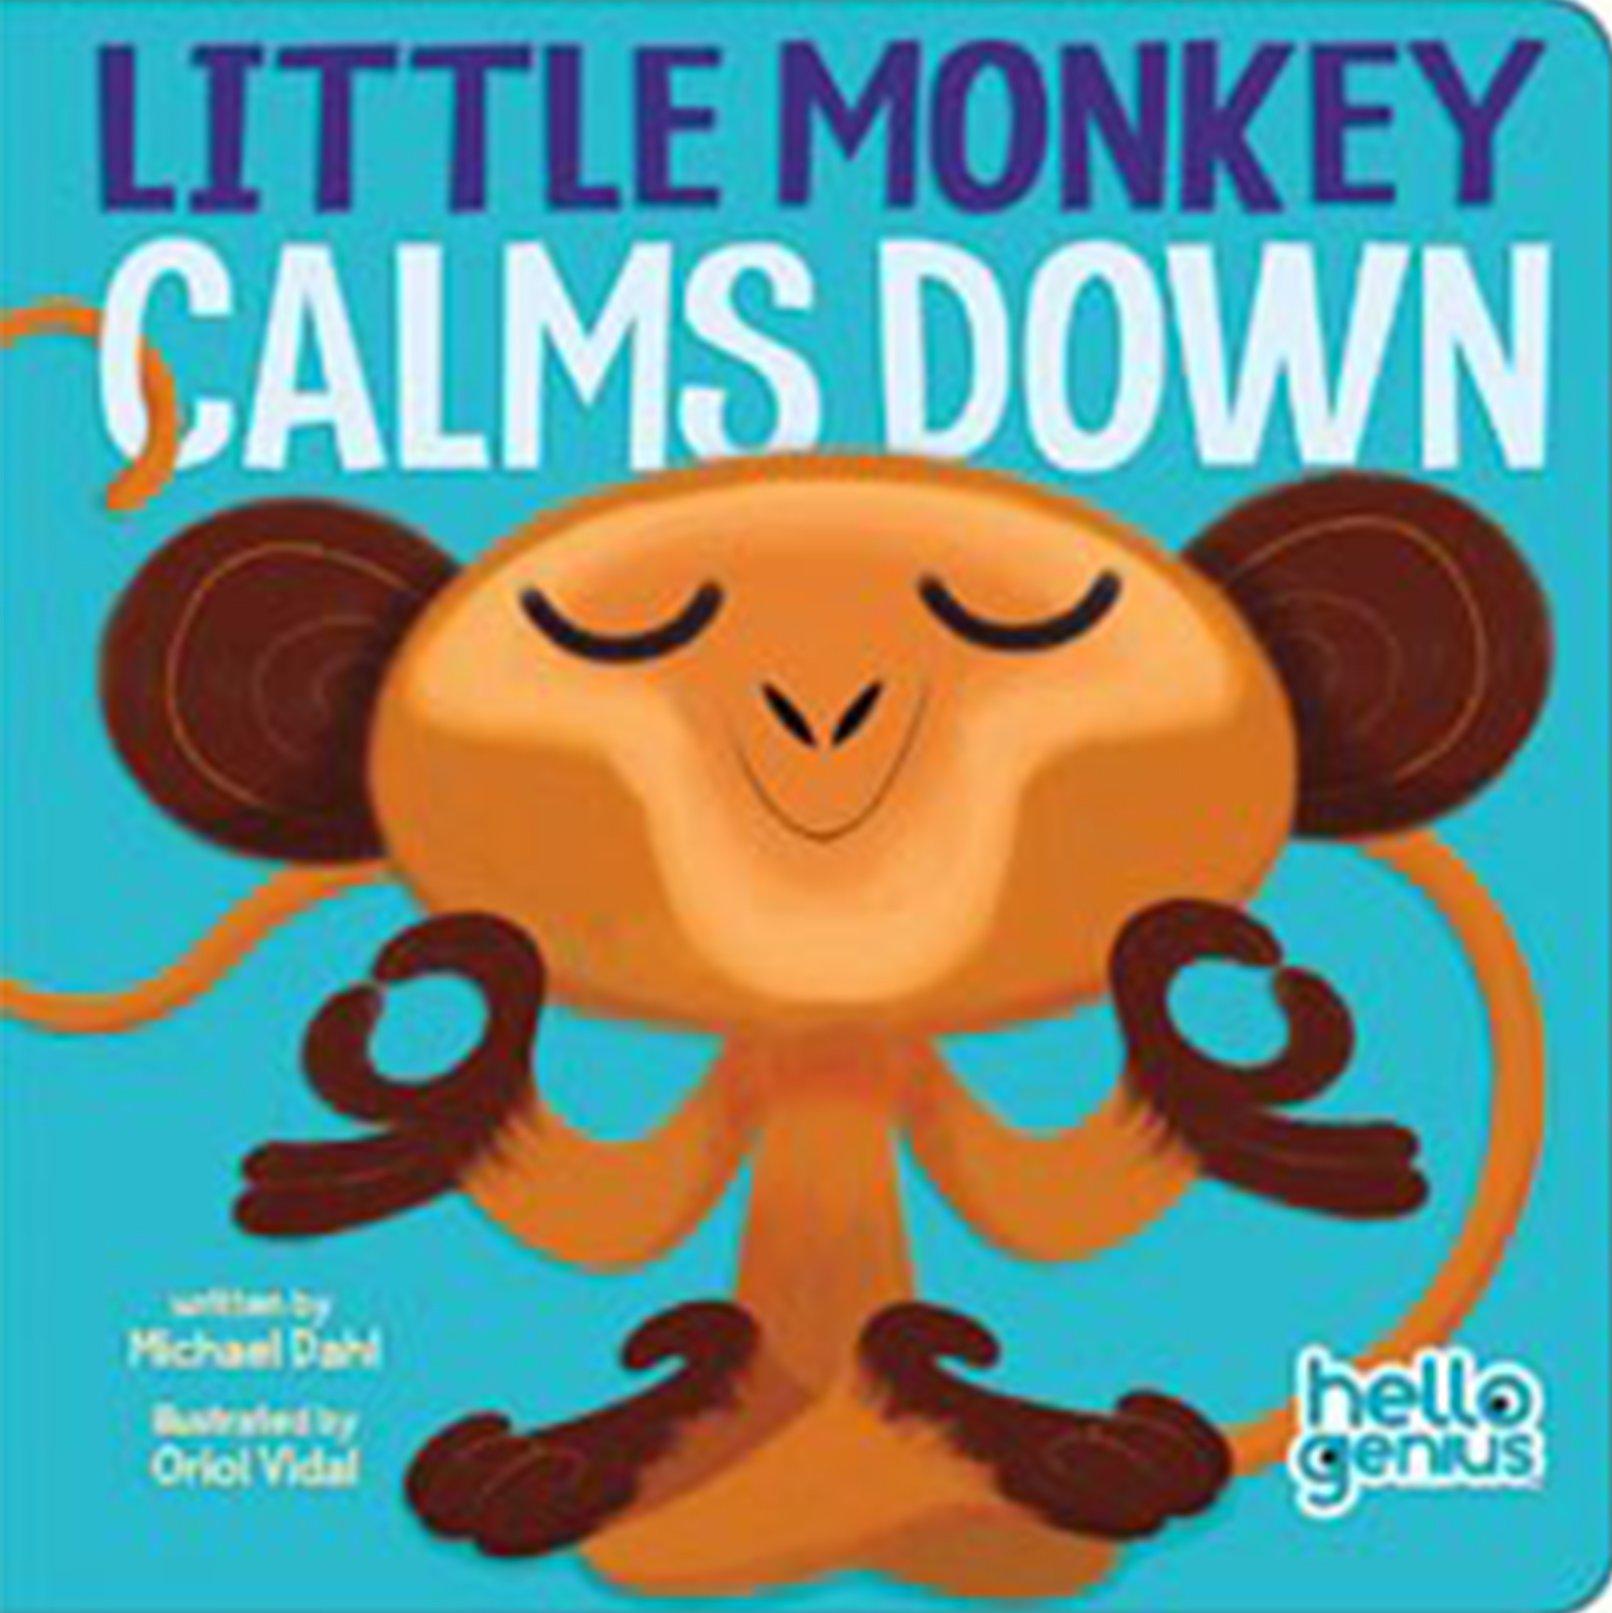 Little Monkey Calms Down (Hello Genius): Dahl, Michael, Vidal, Oriol:  9781479522866: Amazon.com: Books